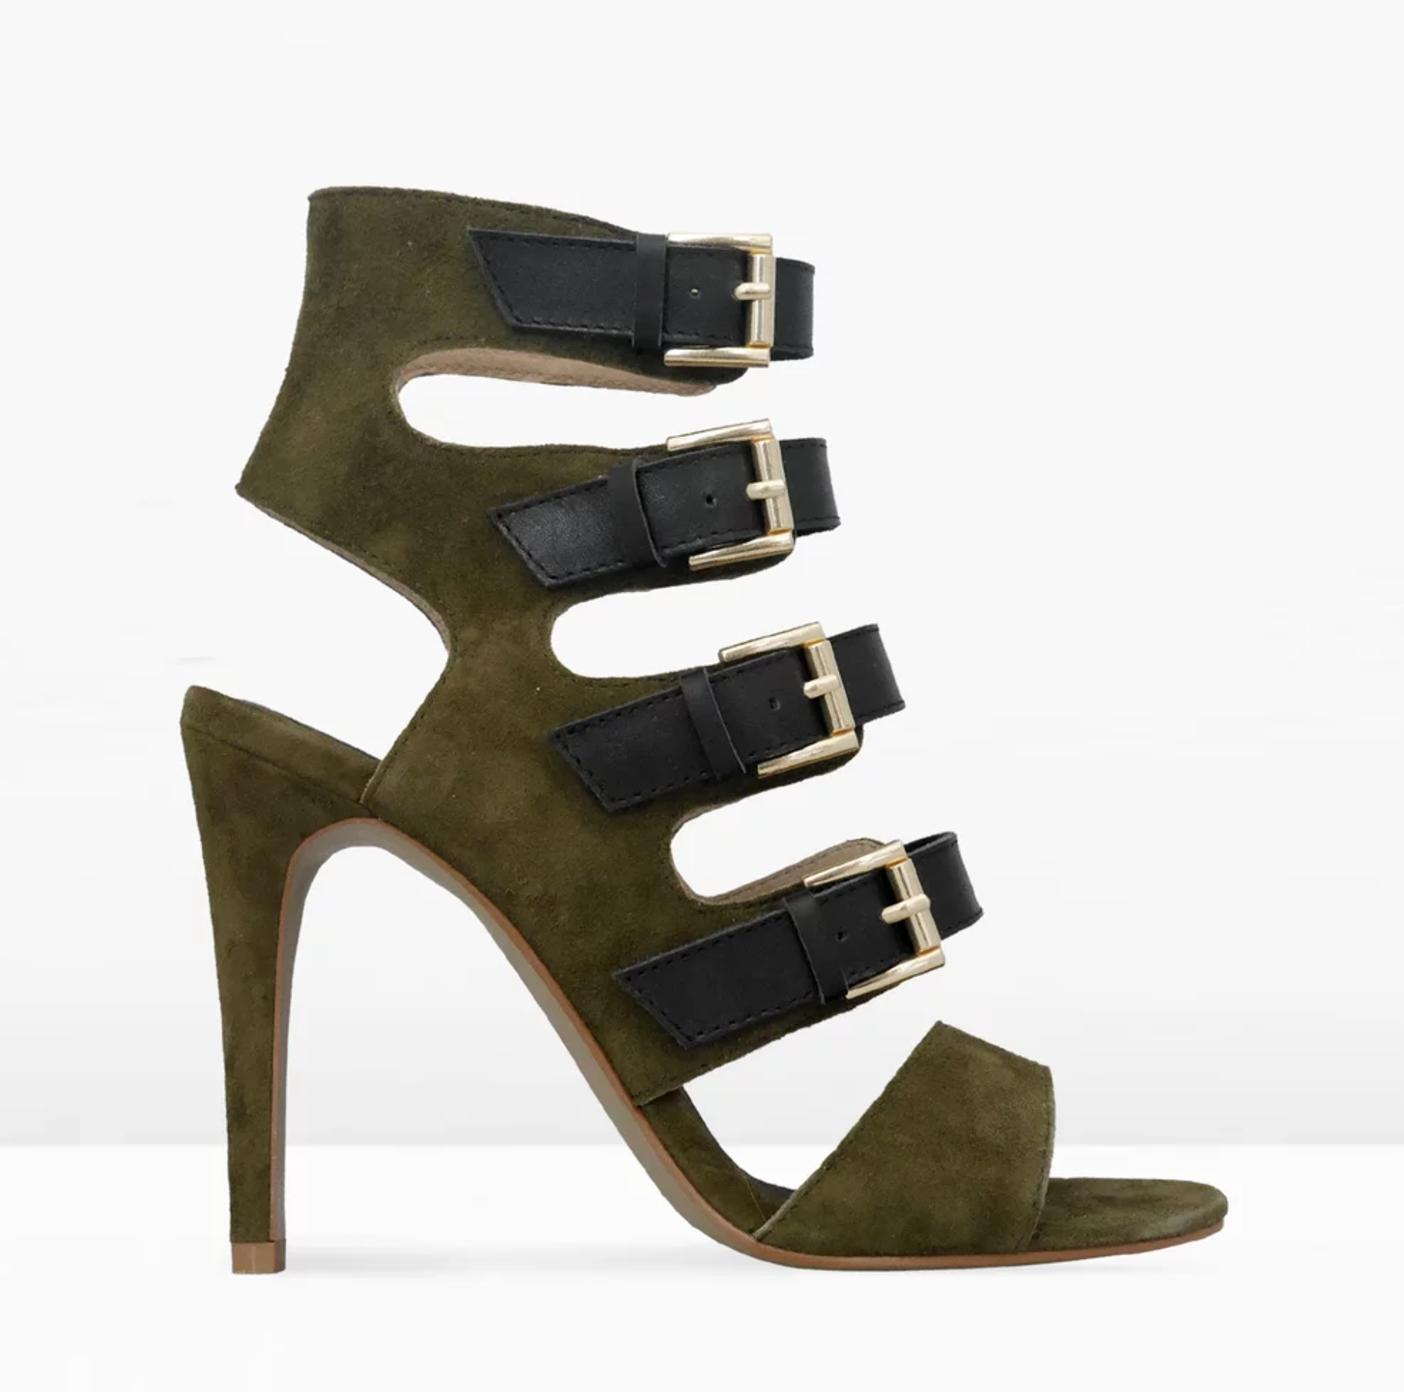 Iris footwear Hanna $159